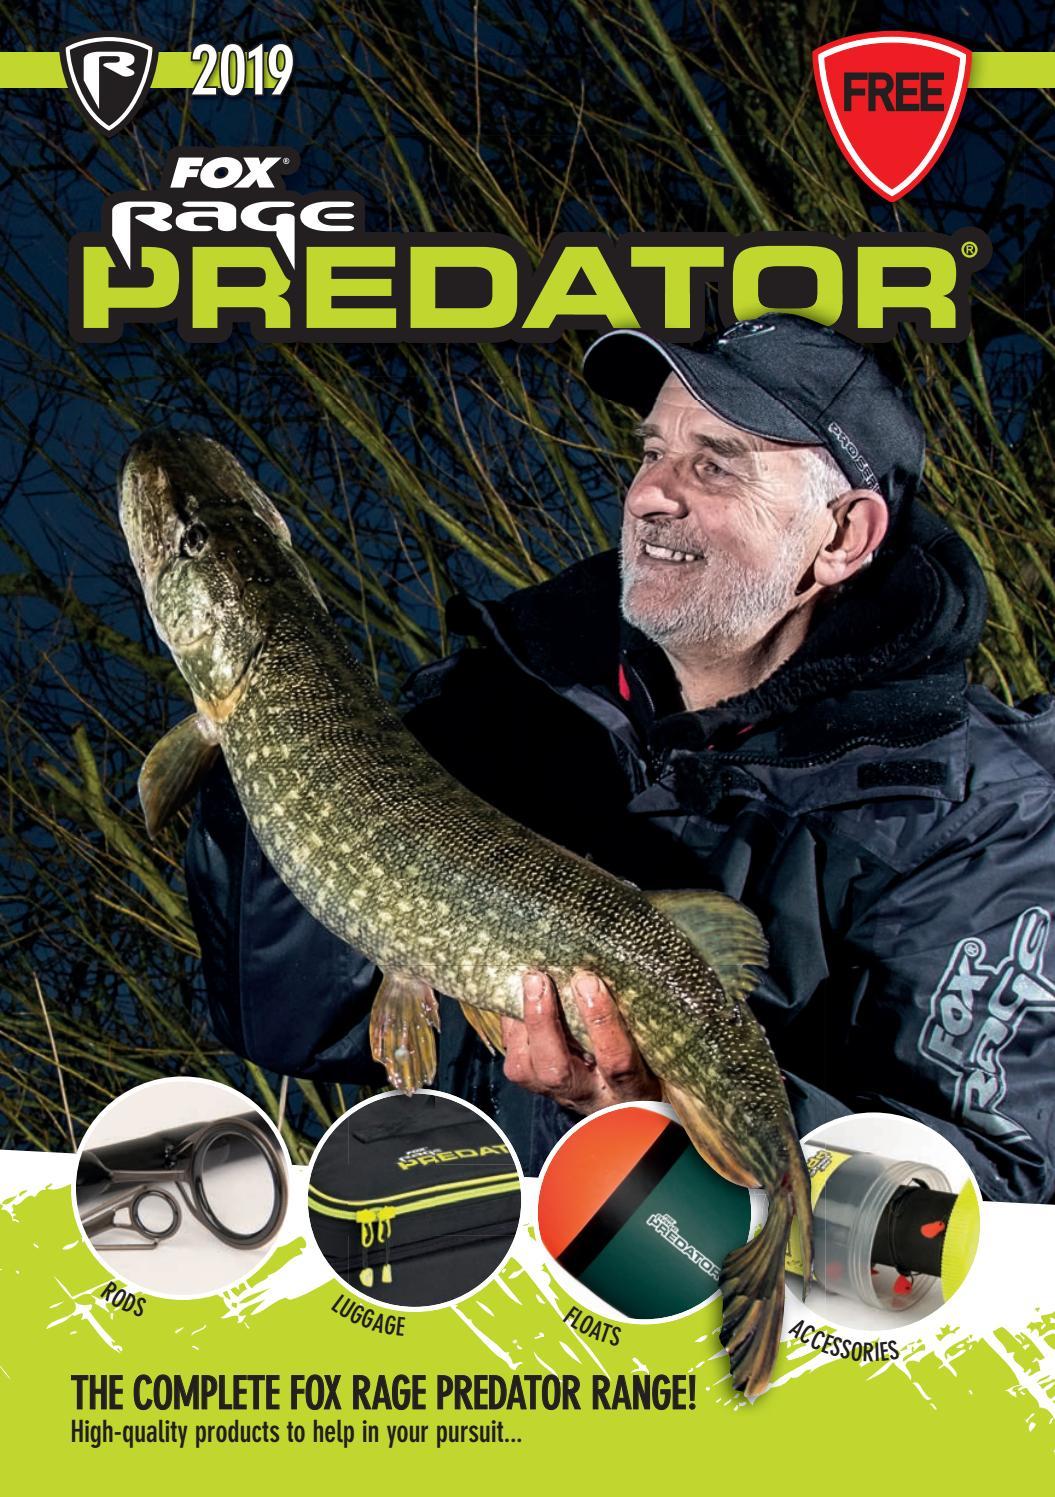 Fox Rage Predator Treble Hook Sleeves Smal Dead Bait angeln FAC054